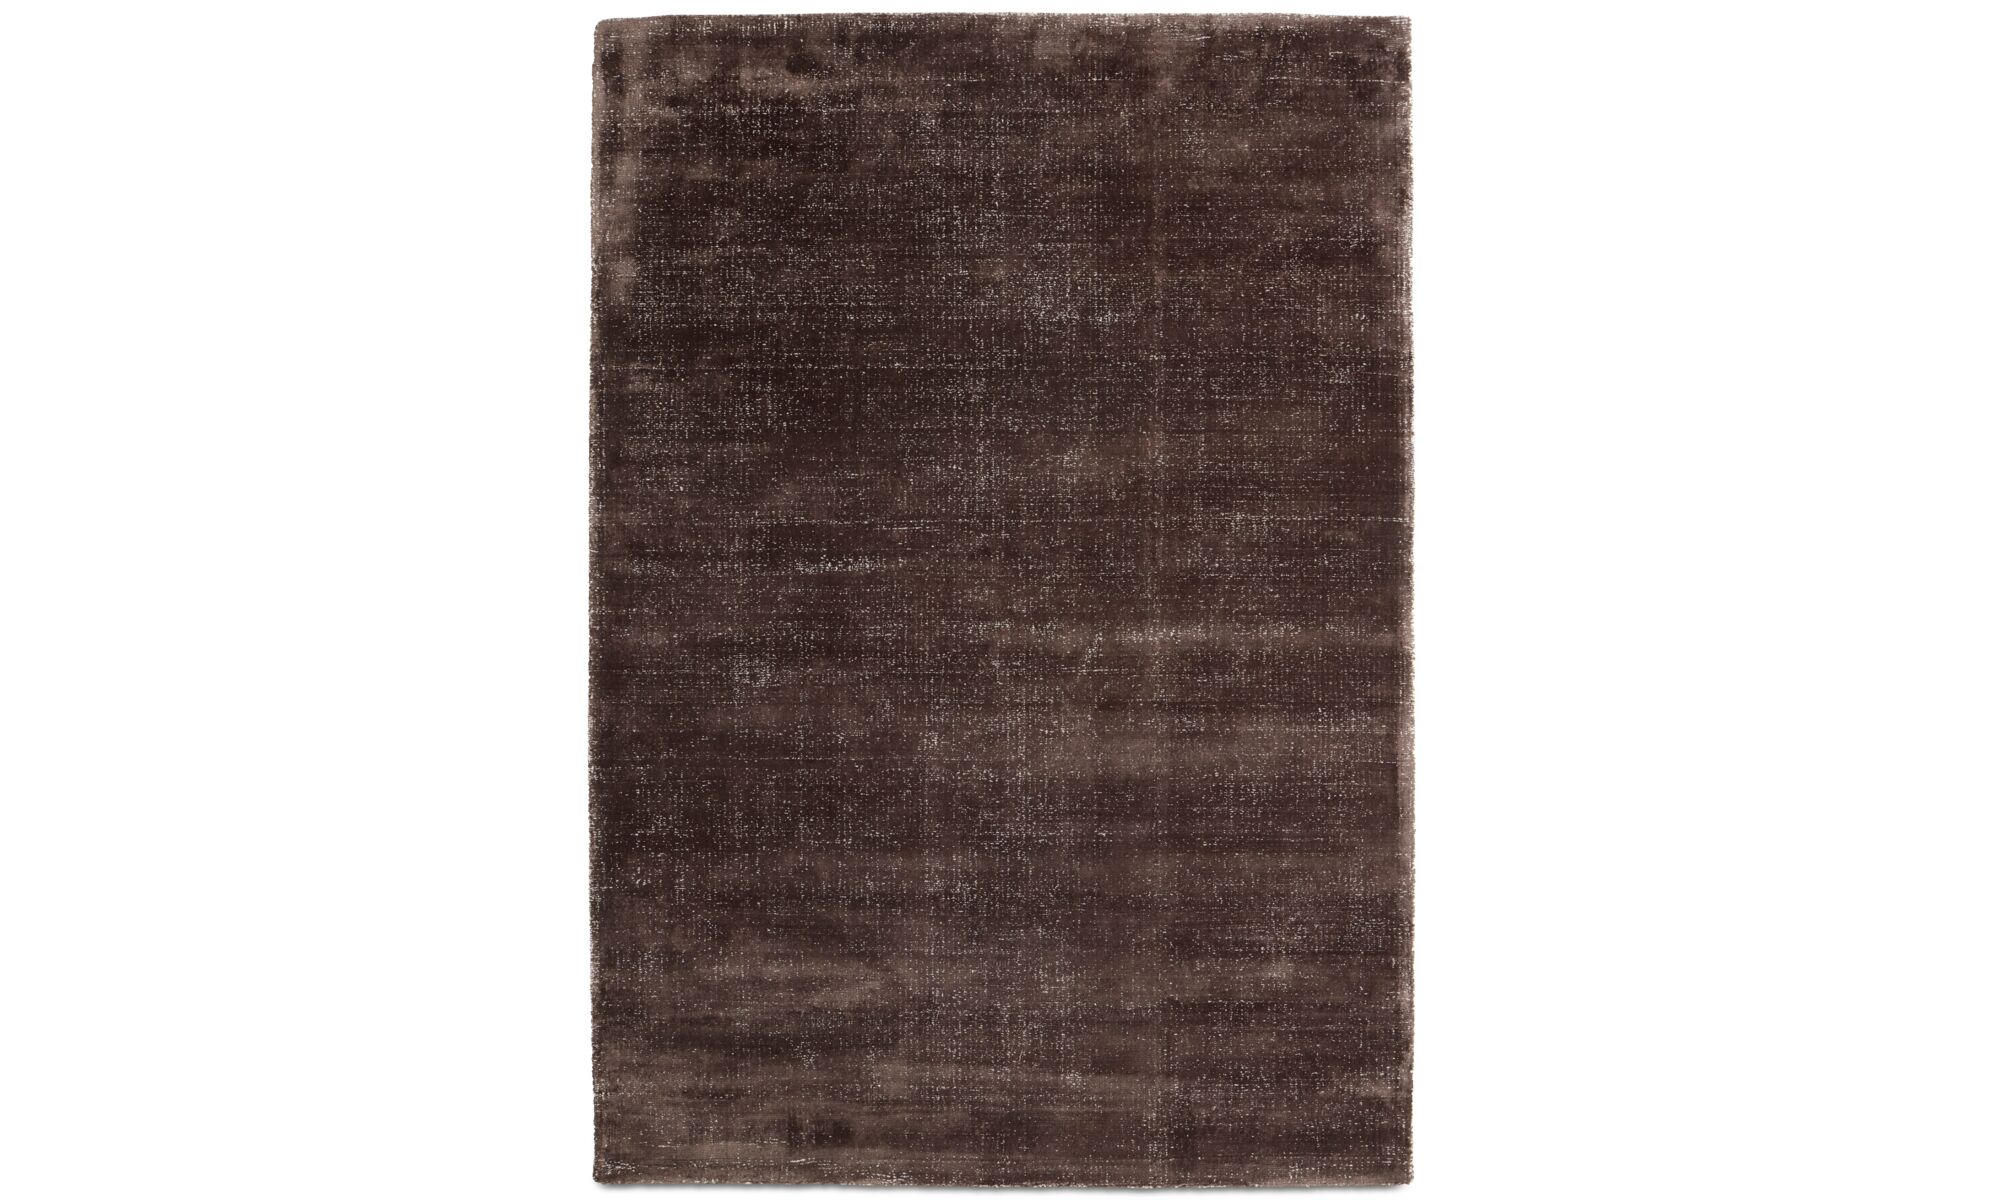 Alfombras - Alfombra Simple - rectangular - En marrón - Lana